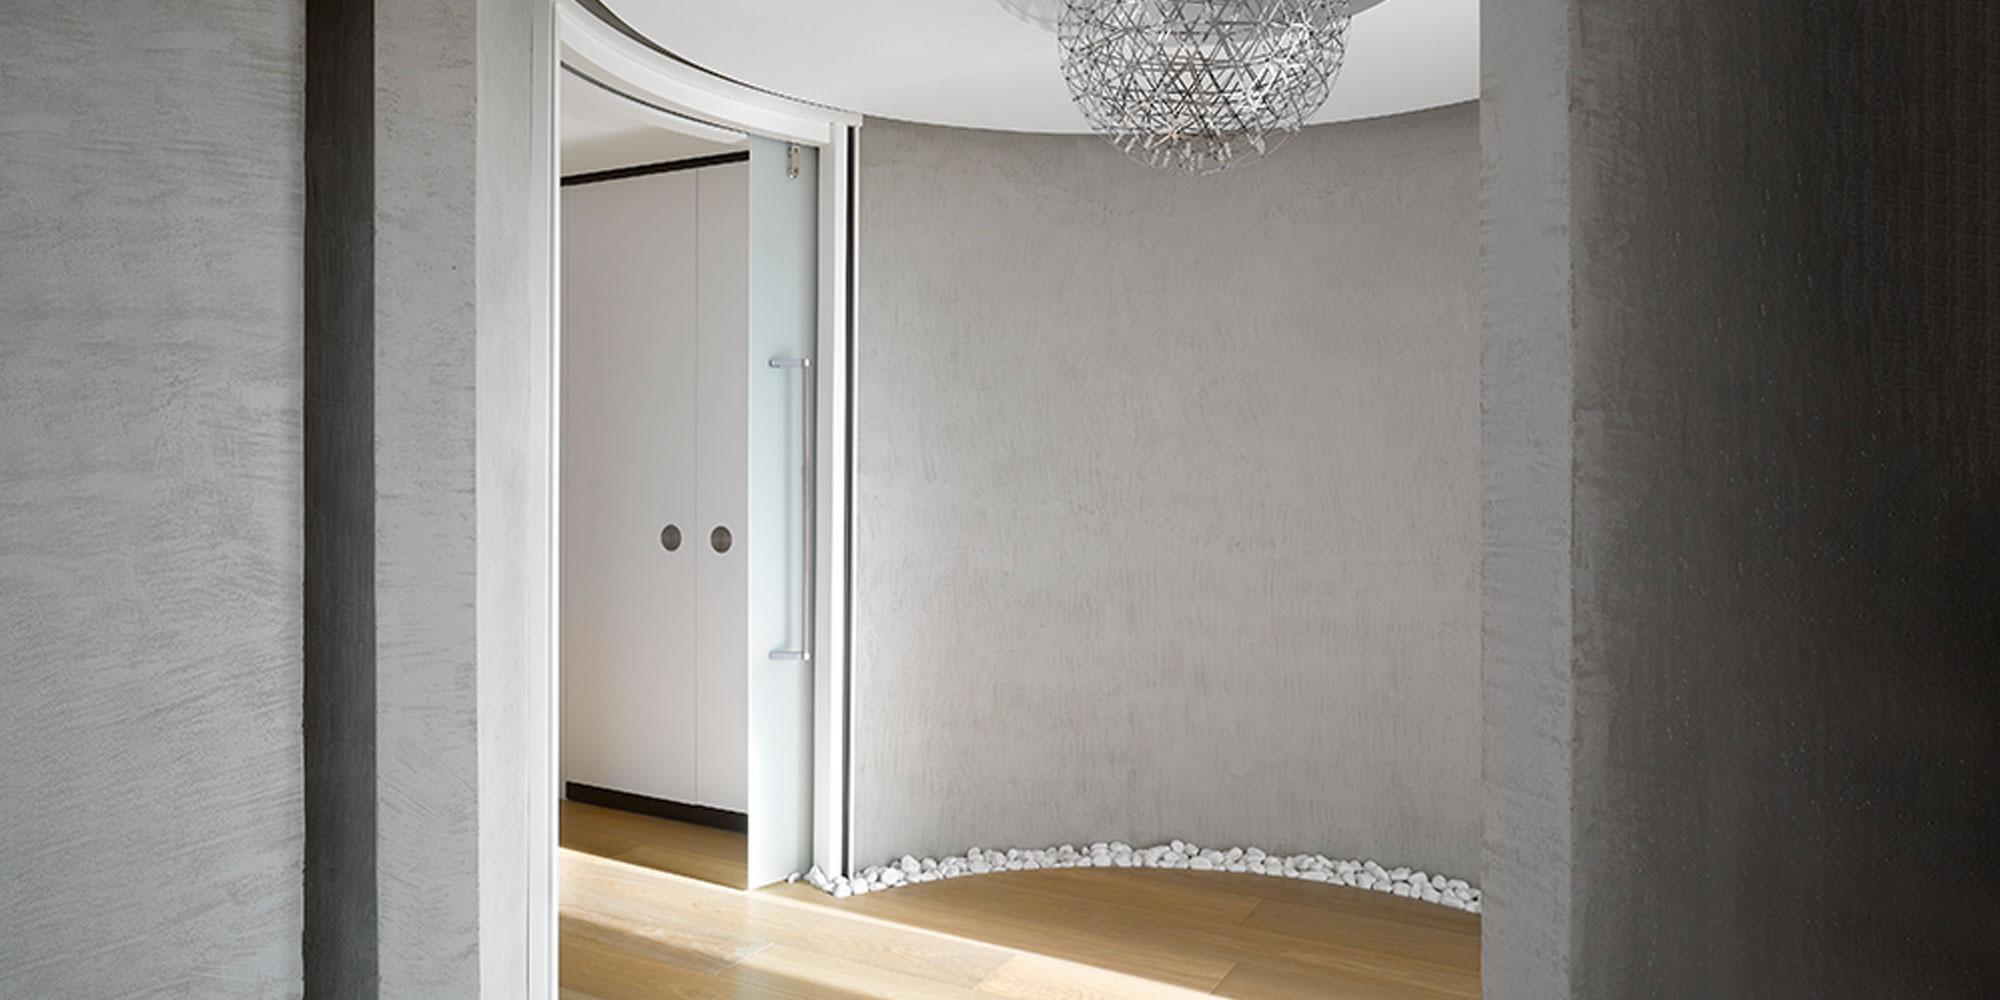 Eclisse Telai Porte Scorrevoli.Prodotti Controtelai Per Porte Eclisse Doors Systems